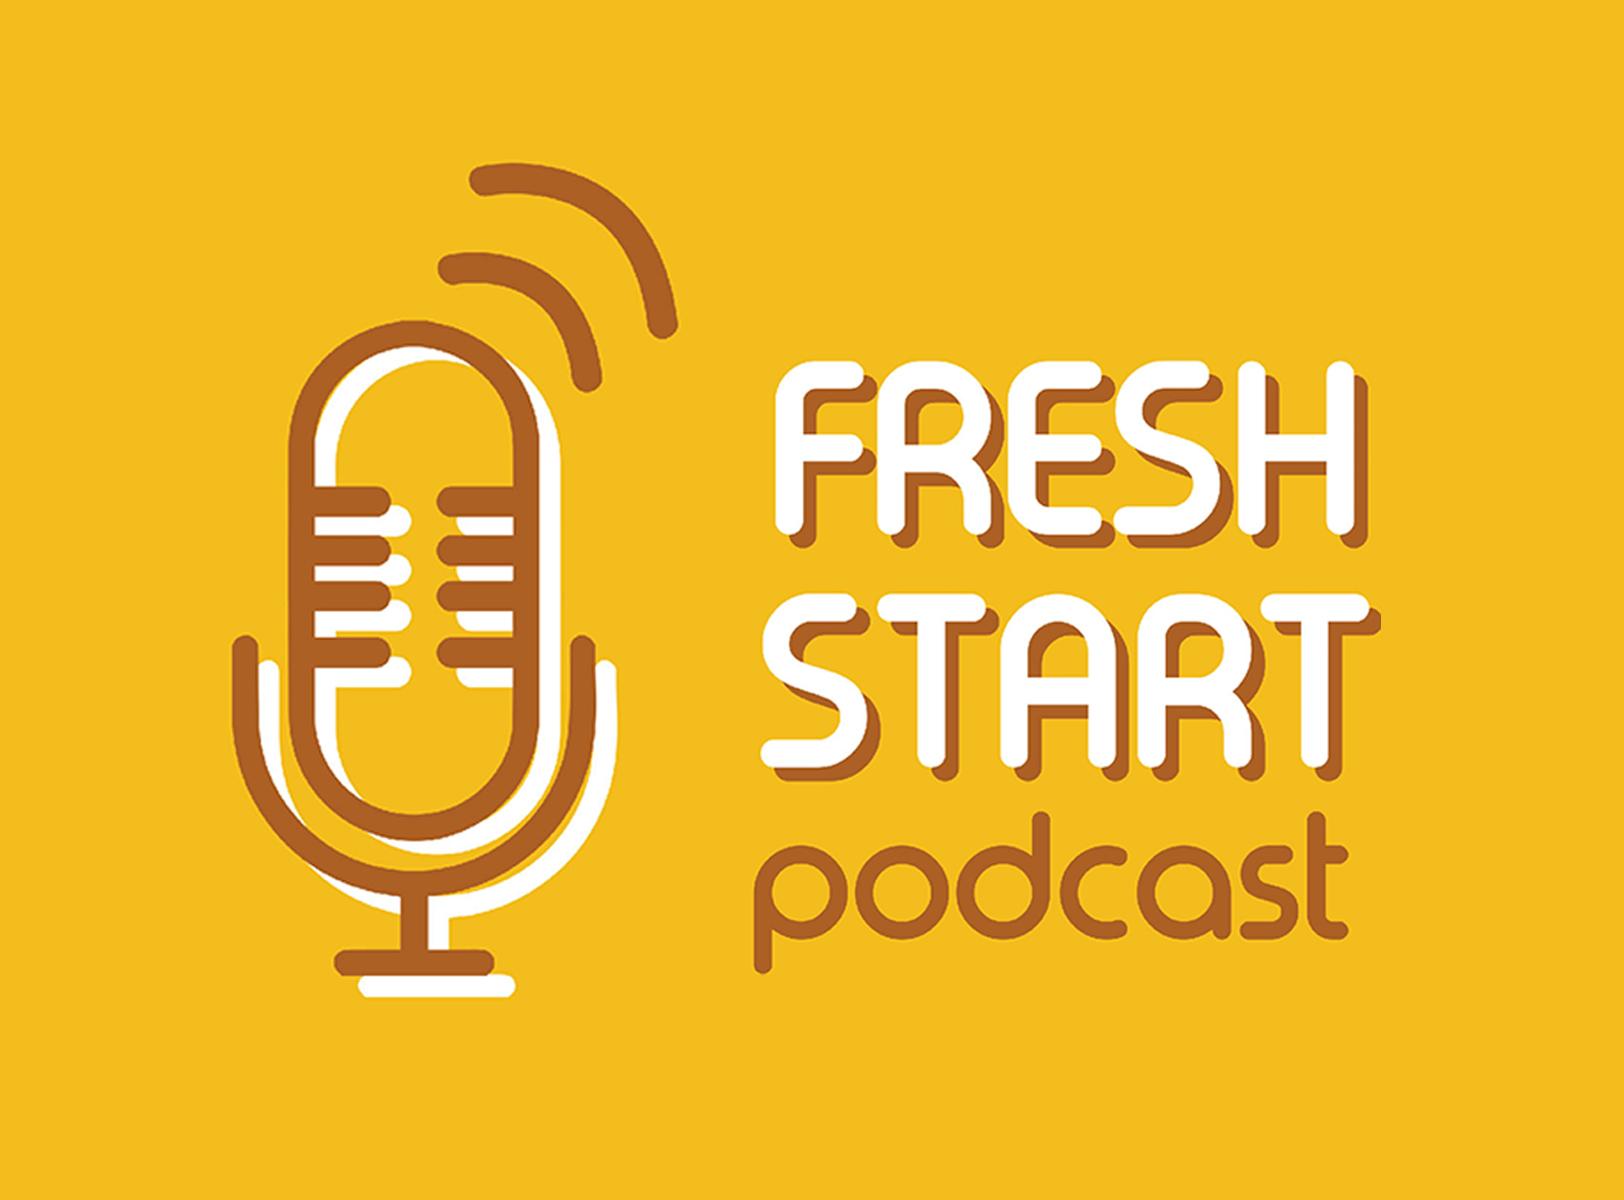 Fresh Start: Podcast News (10/31/2019 Thu.)